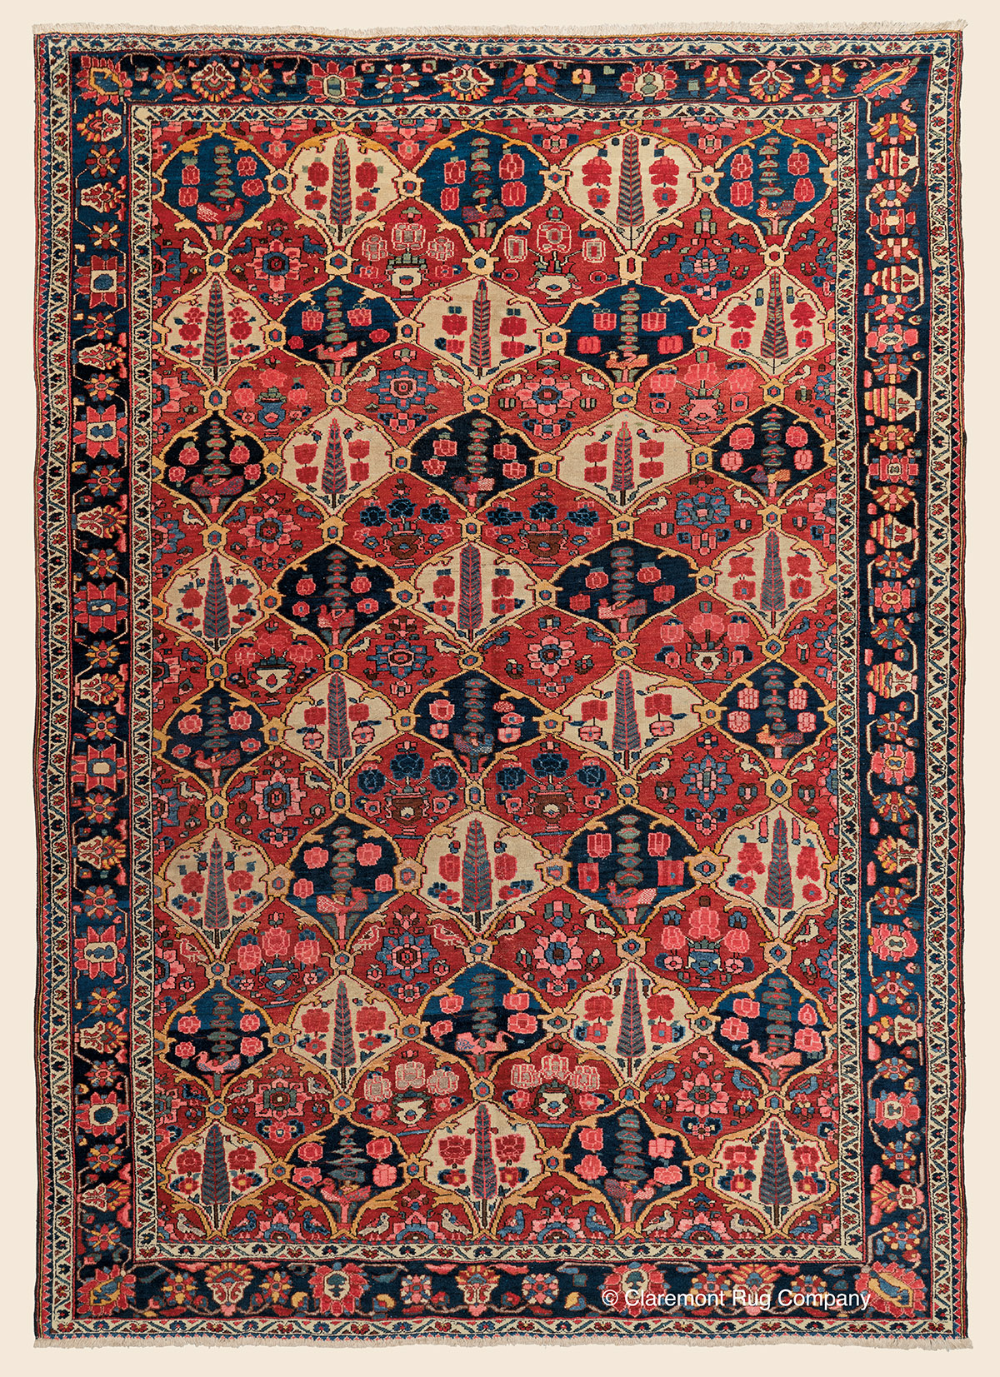 Antique Central Persian Bakhtiari Garden Compartment Room Size Rug